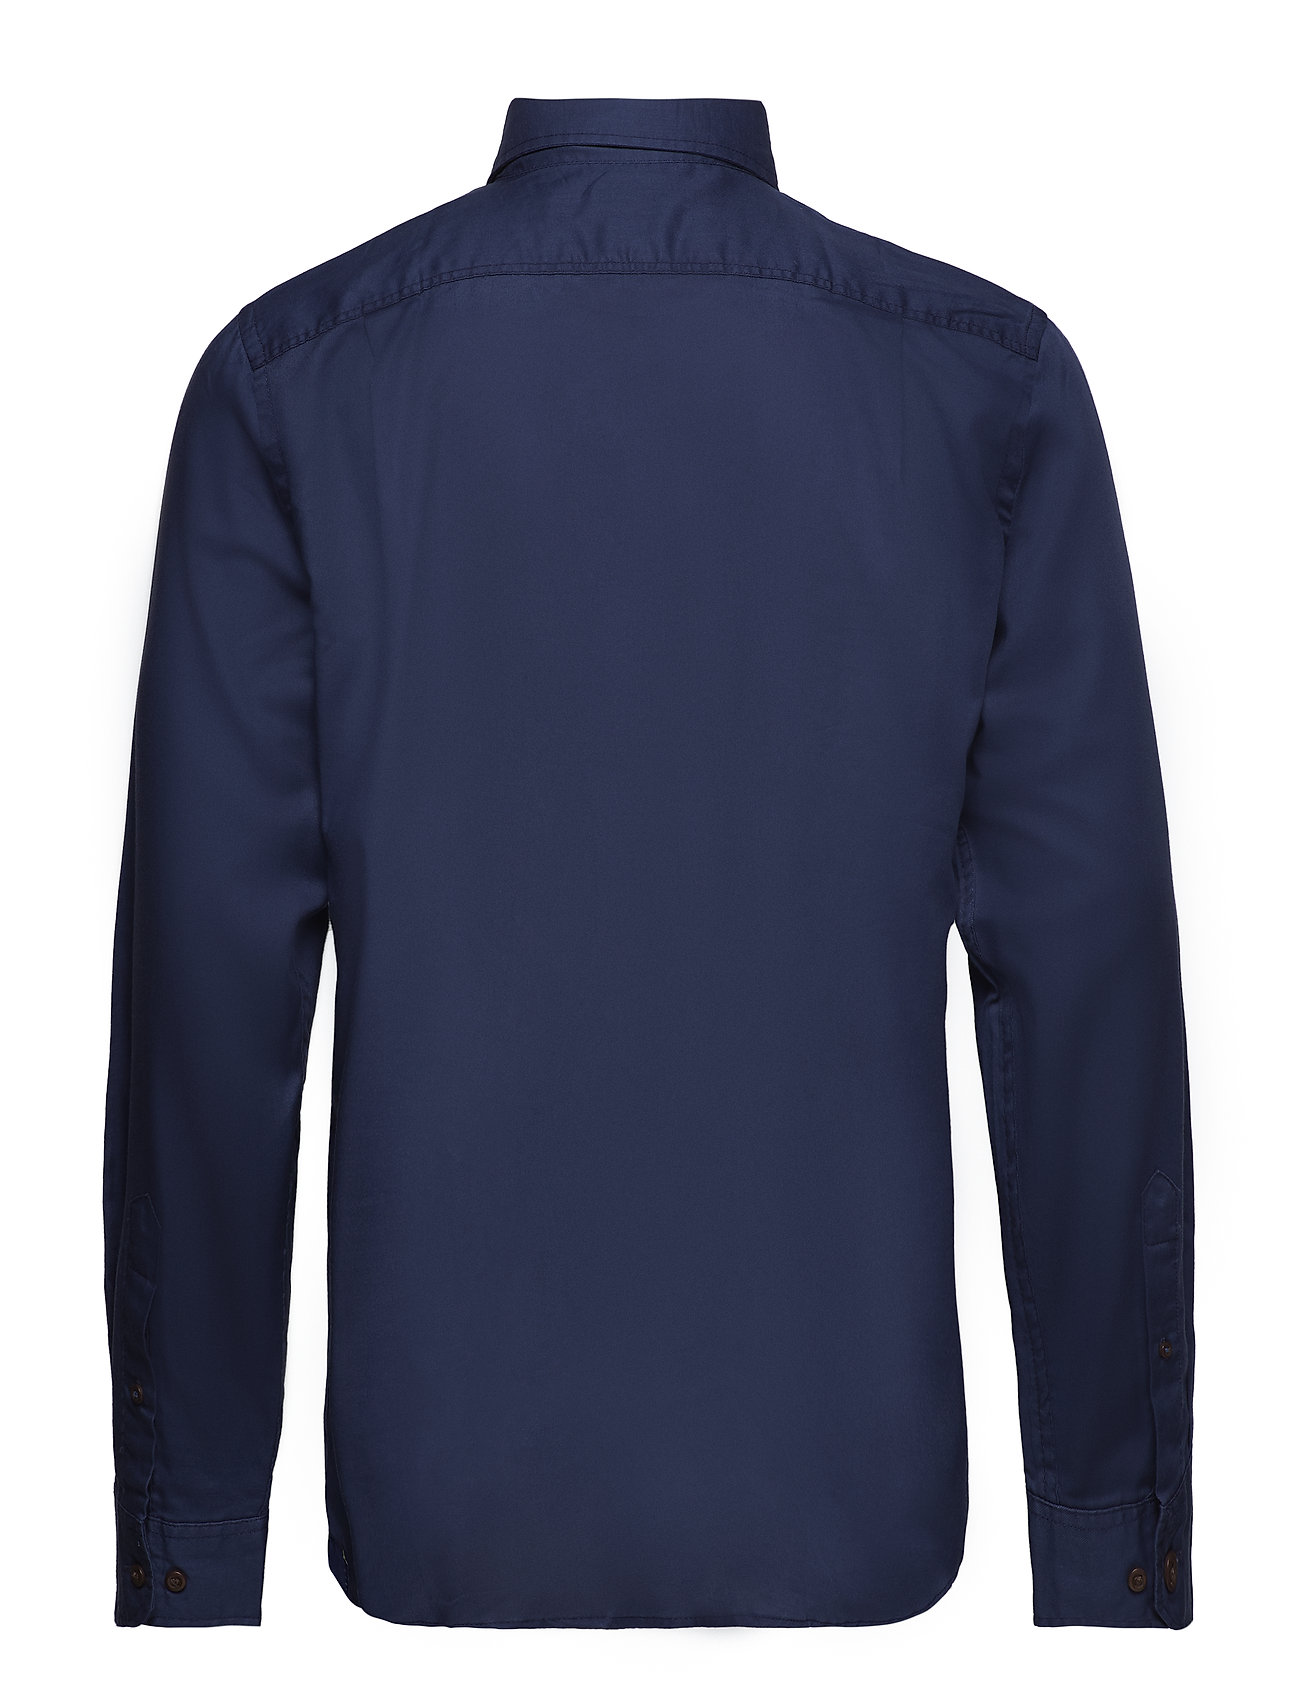 Garment Dyed ShirtpeacoatIzod Garment Dyed Garment Garment ShirtpeacoatIzod Dyed Dyed ShirtpeacoatIzod PkXuZi